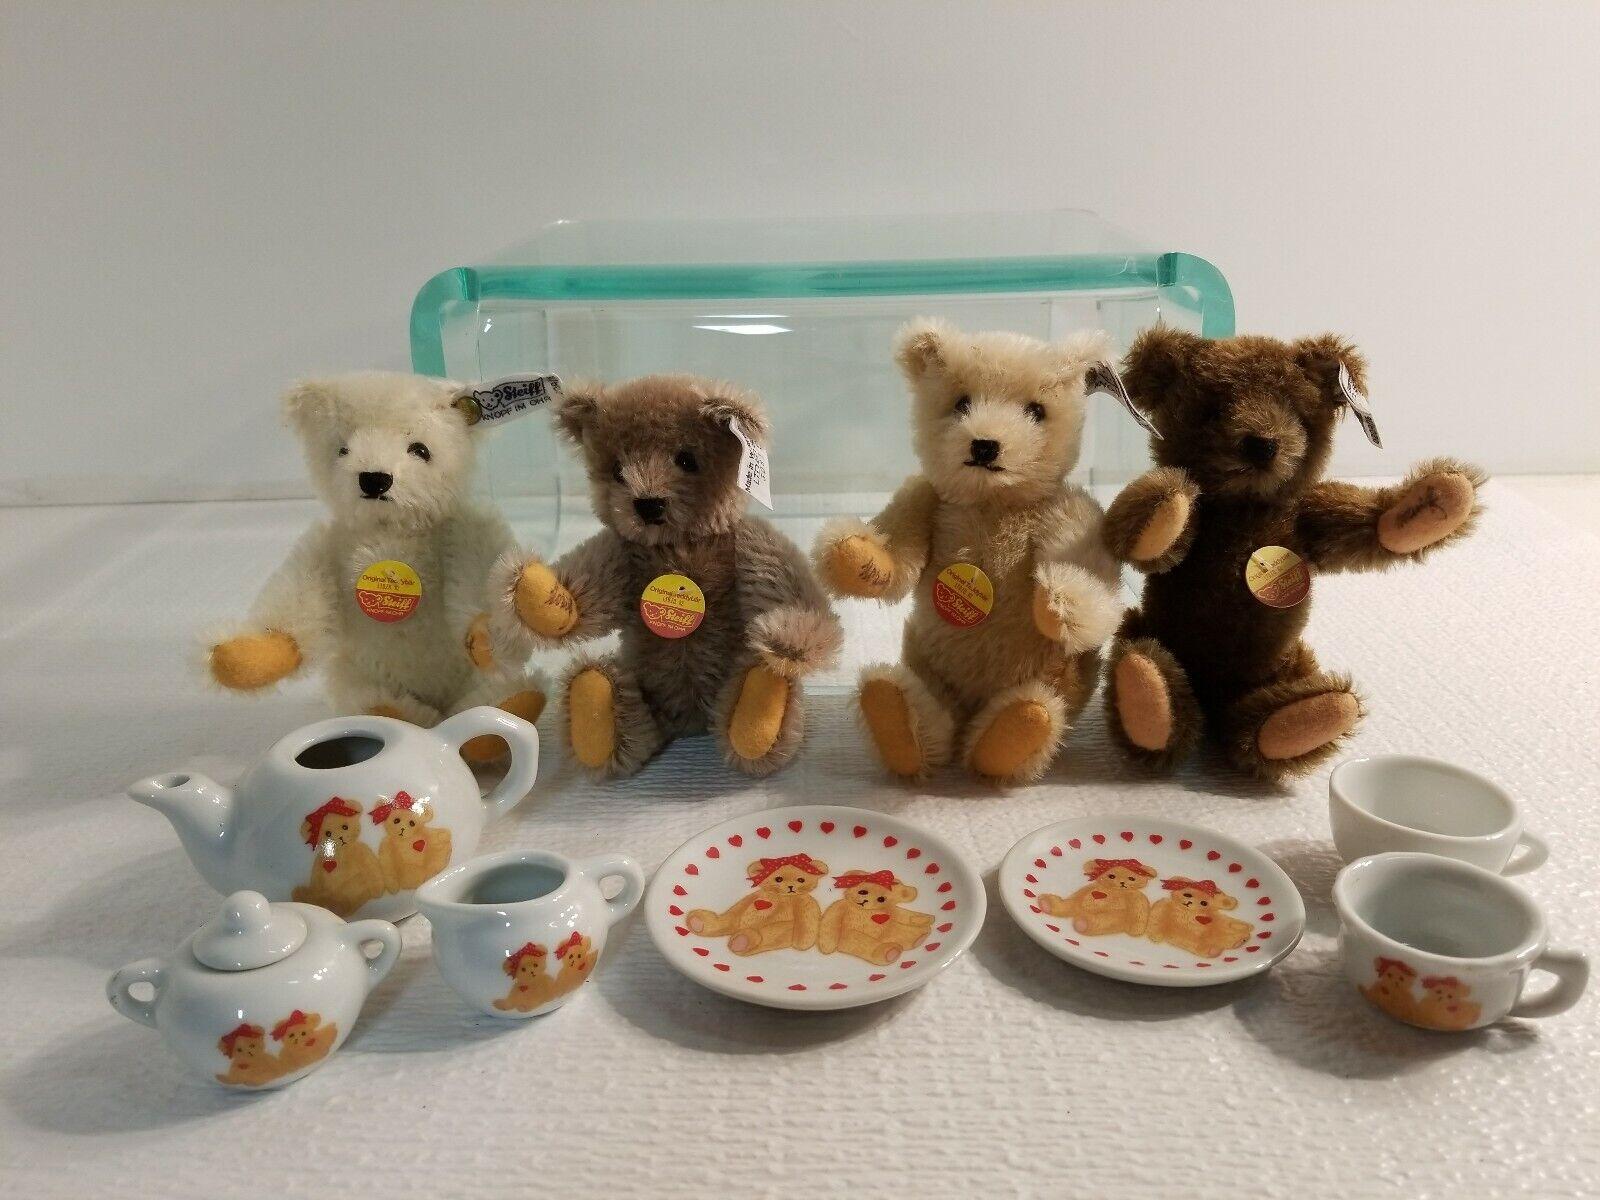 4 STEIFF Germany Teddy Bear Tea Party Set Ltd Ed. '82 3081 Autographed-Signed